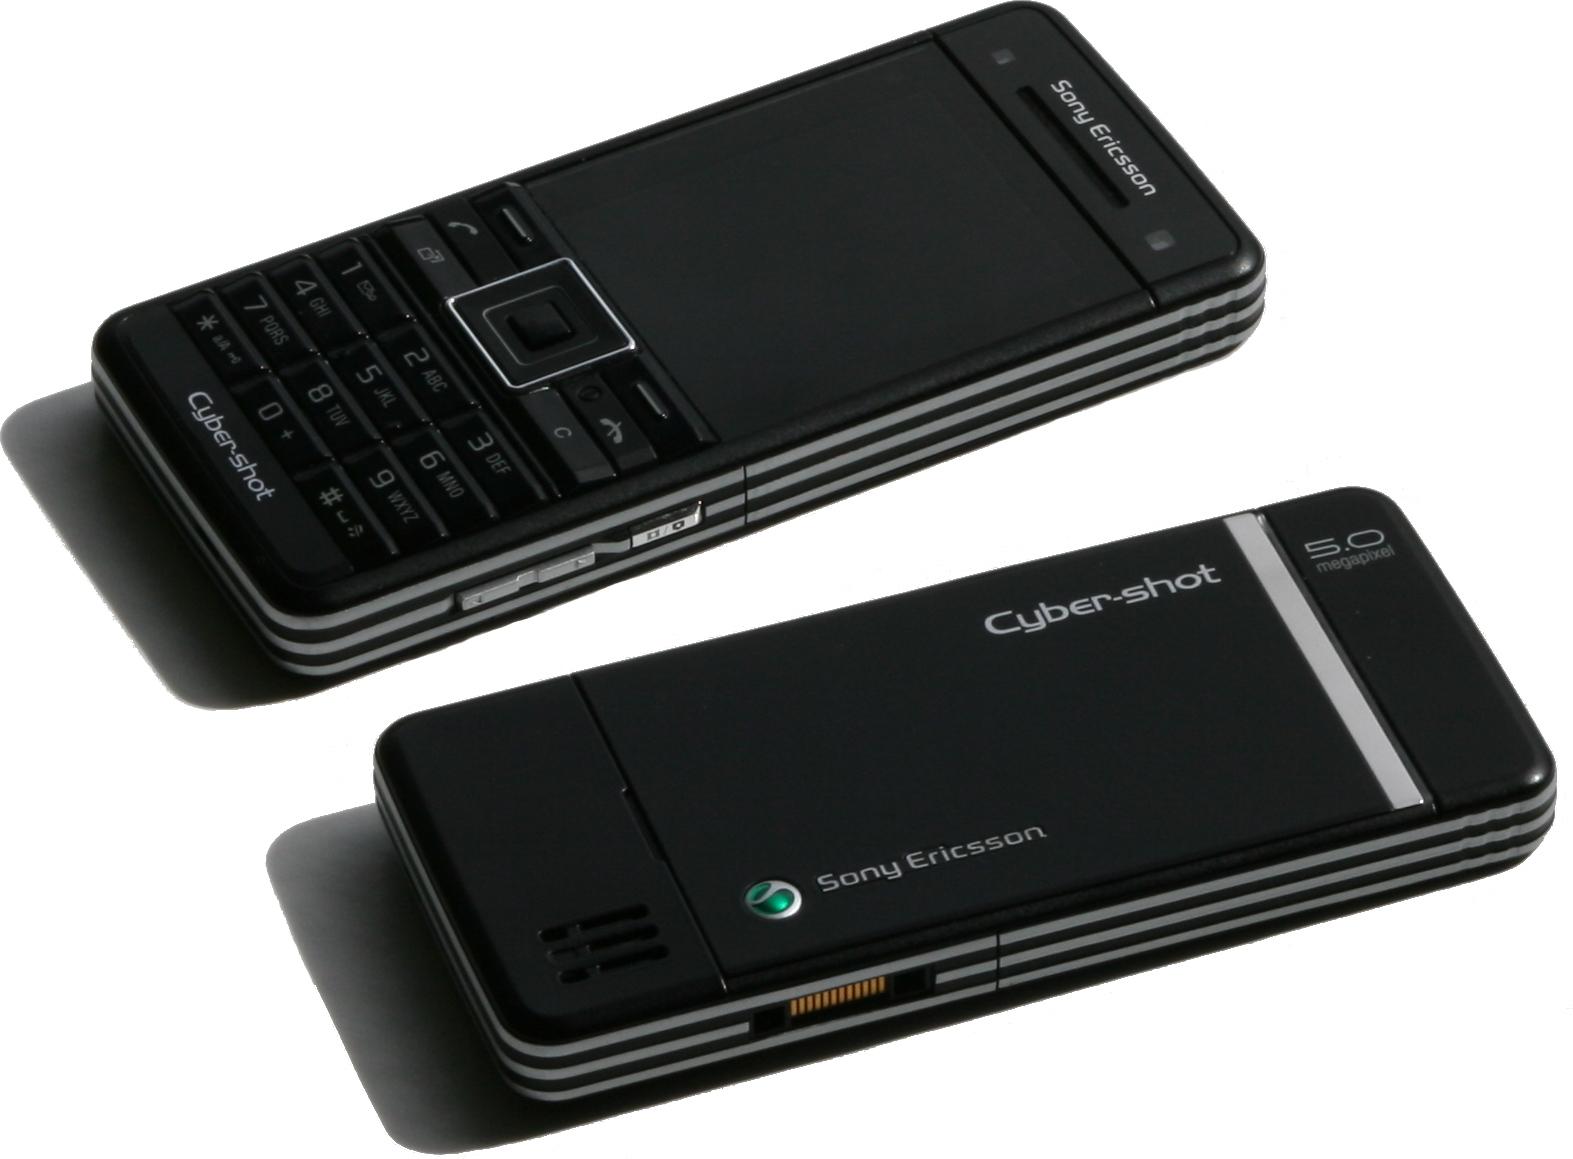 File:Sony Ericsson C902 (Swift Black), front and back.jpg - Wikipedia ...: en.m.wikipedia.org/wiki/File:Sony_Ericsson_C902_(Swift_Black...